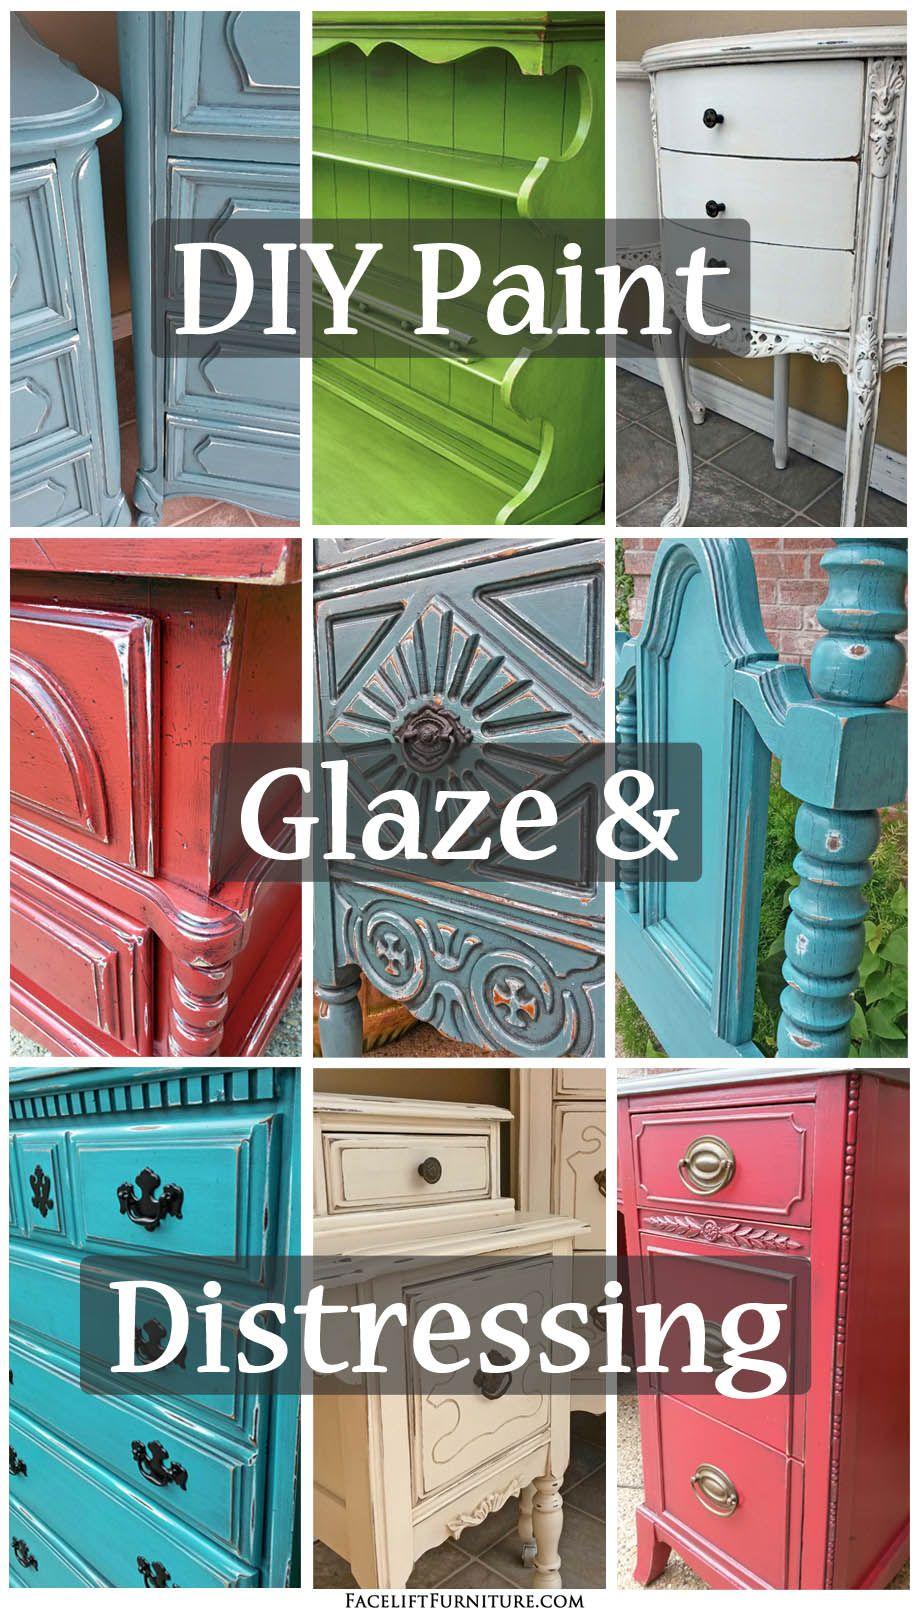 distressing old furniture. DIY Paint, Glaze \u0026 Distressing - Facelift Furniture Old